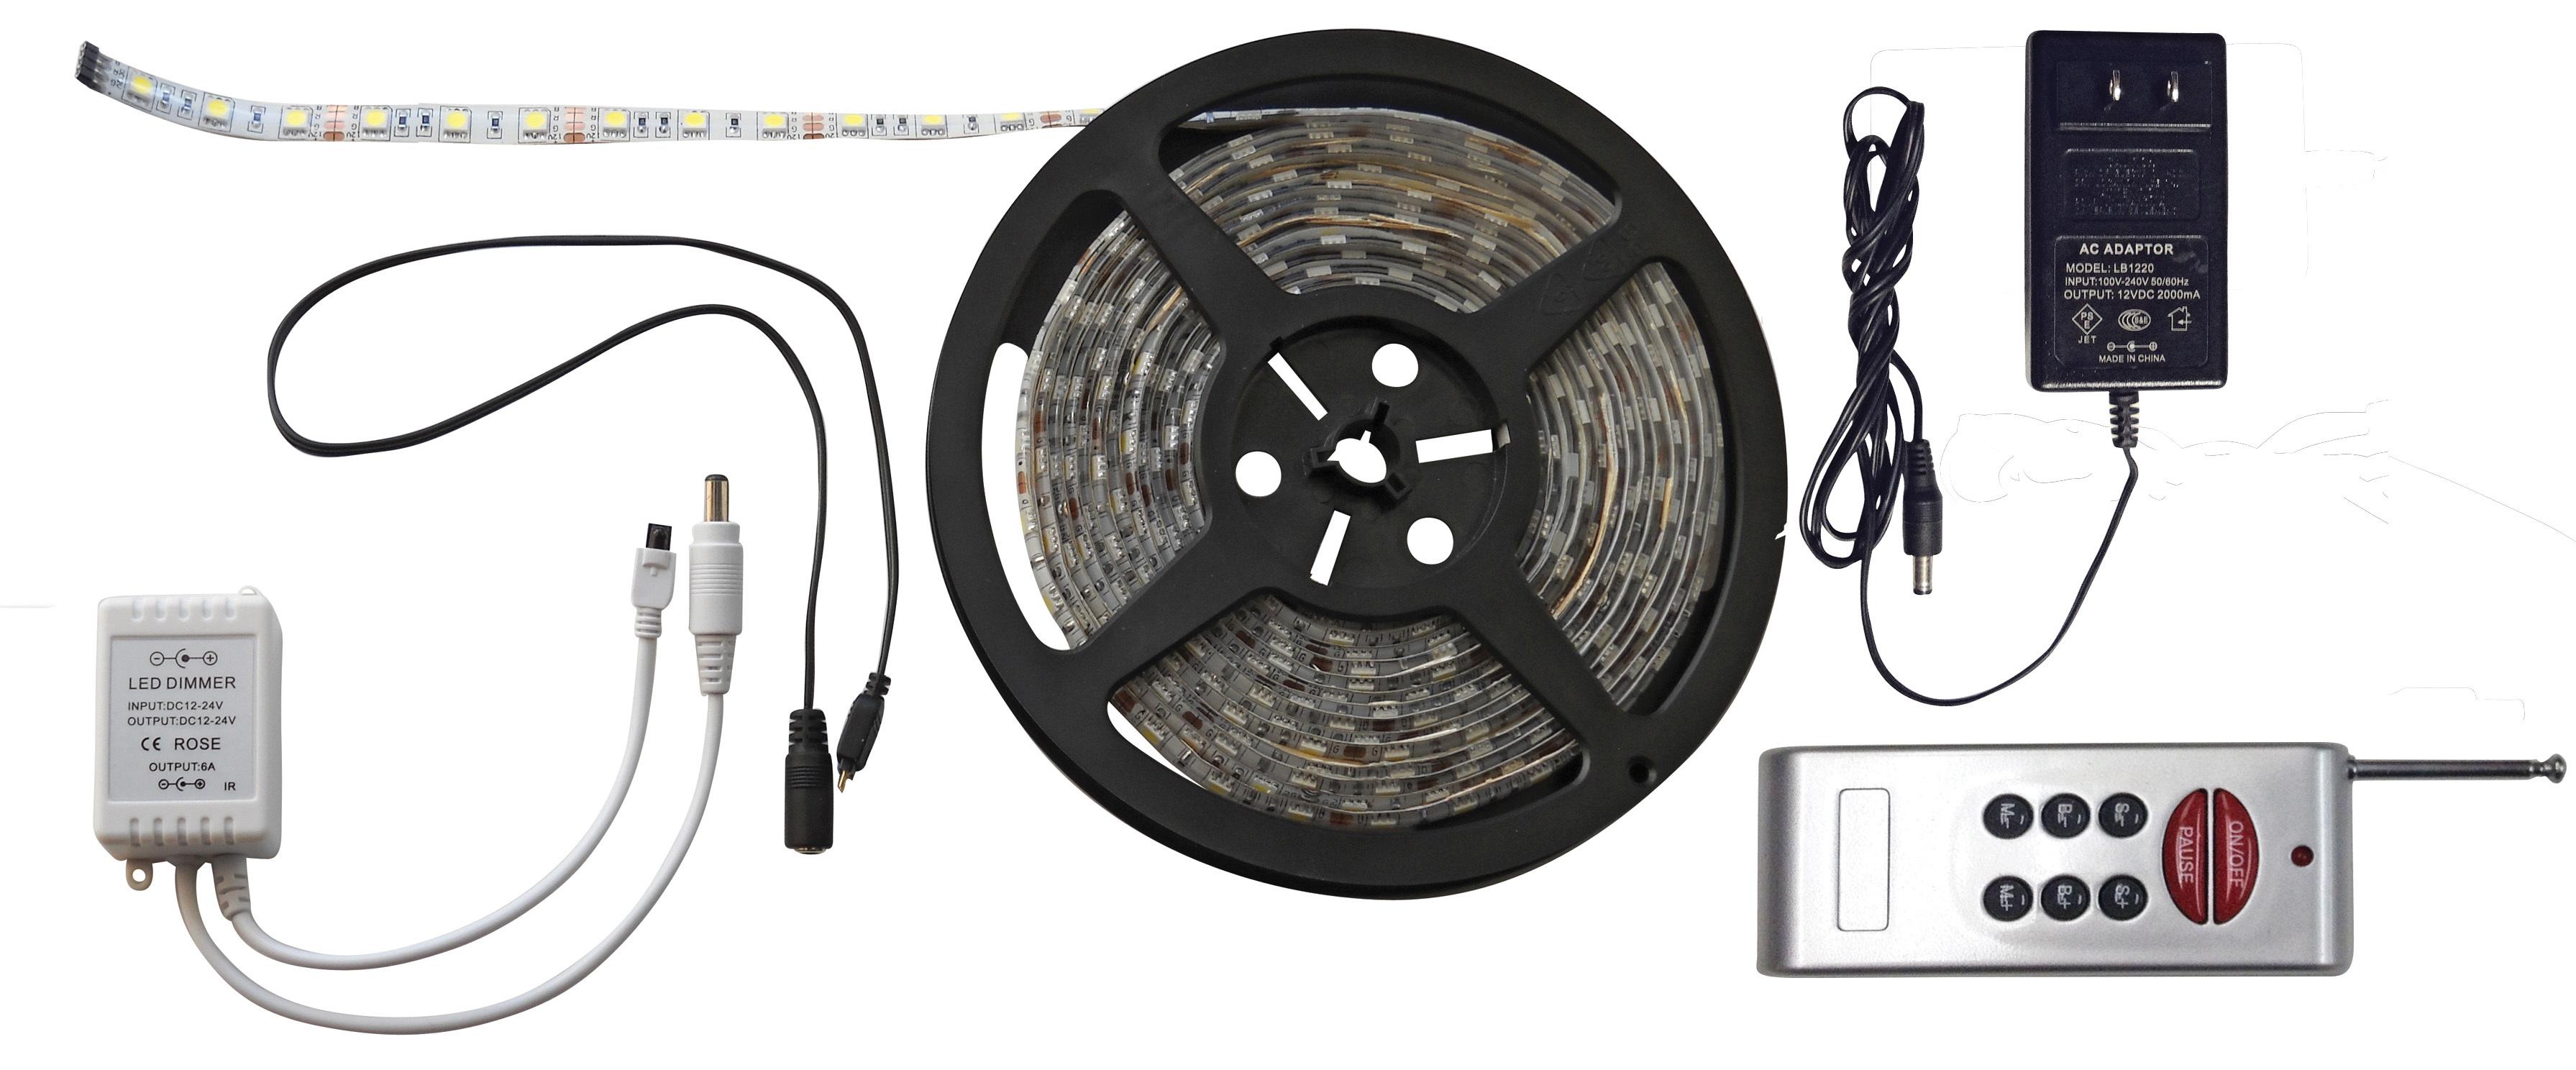 6 Foot RGB LED Strip Light Kit with RF Remote 52687-RF